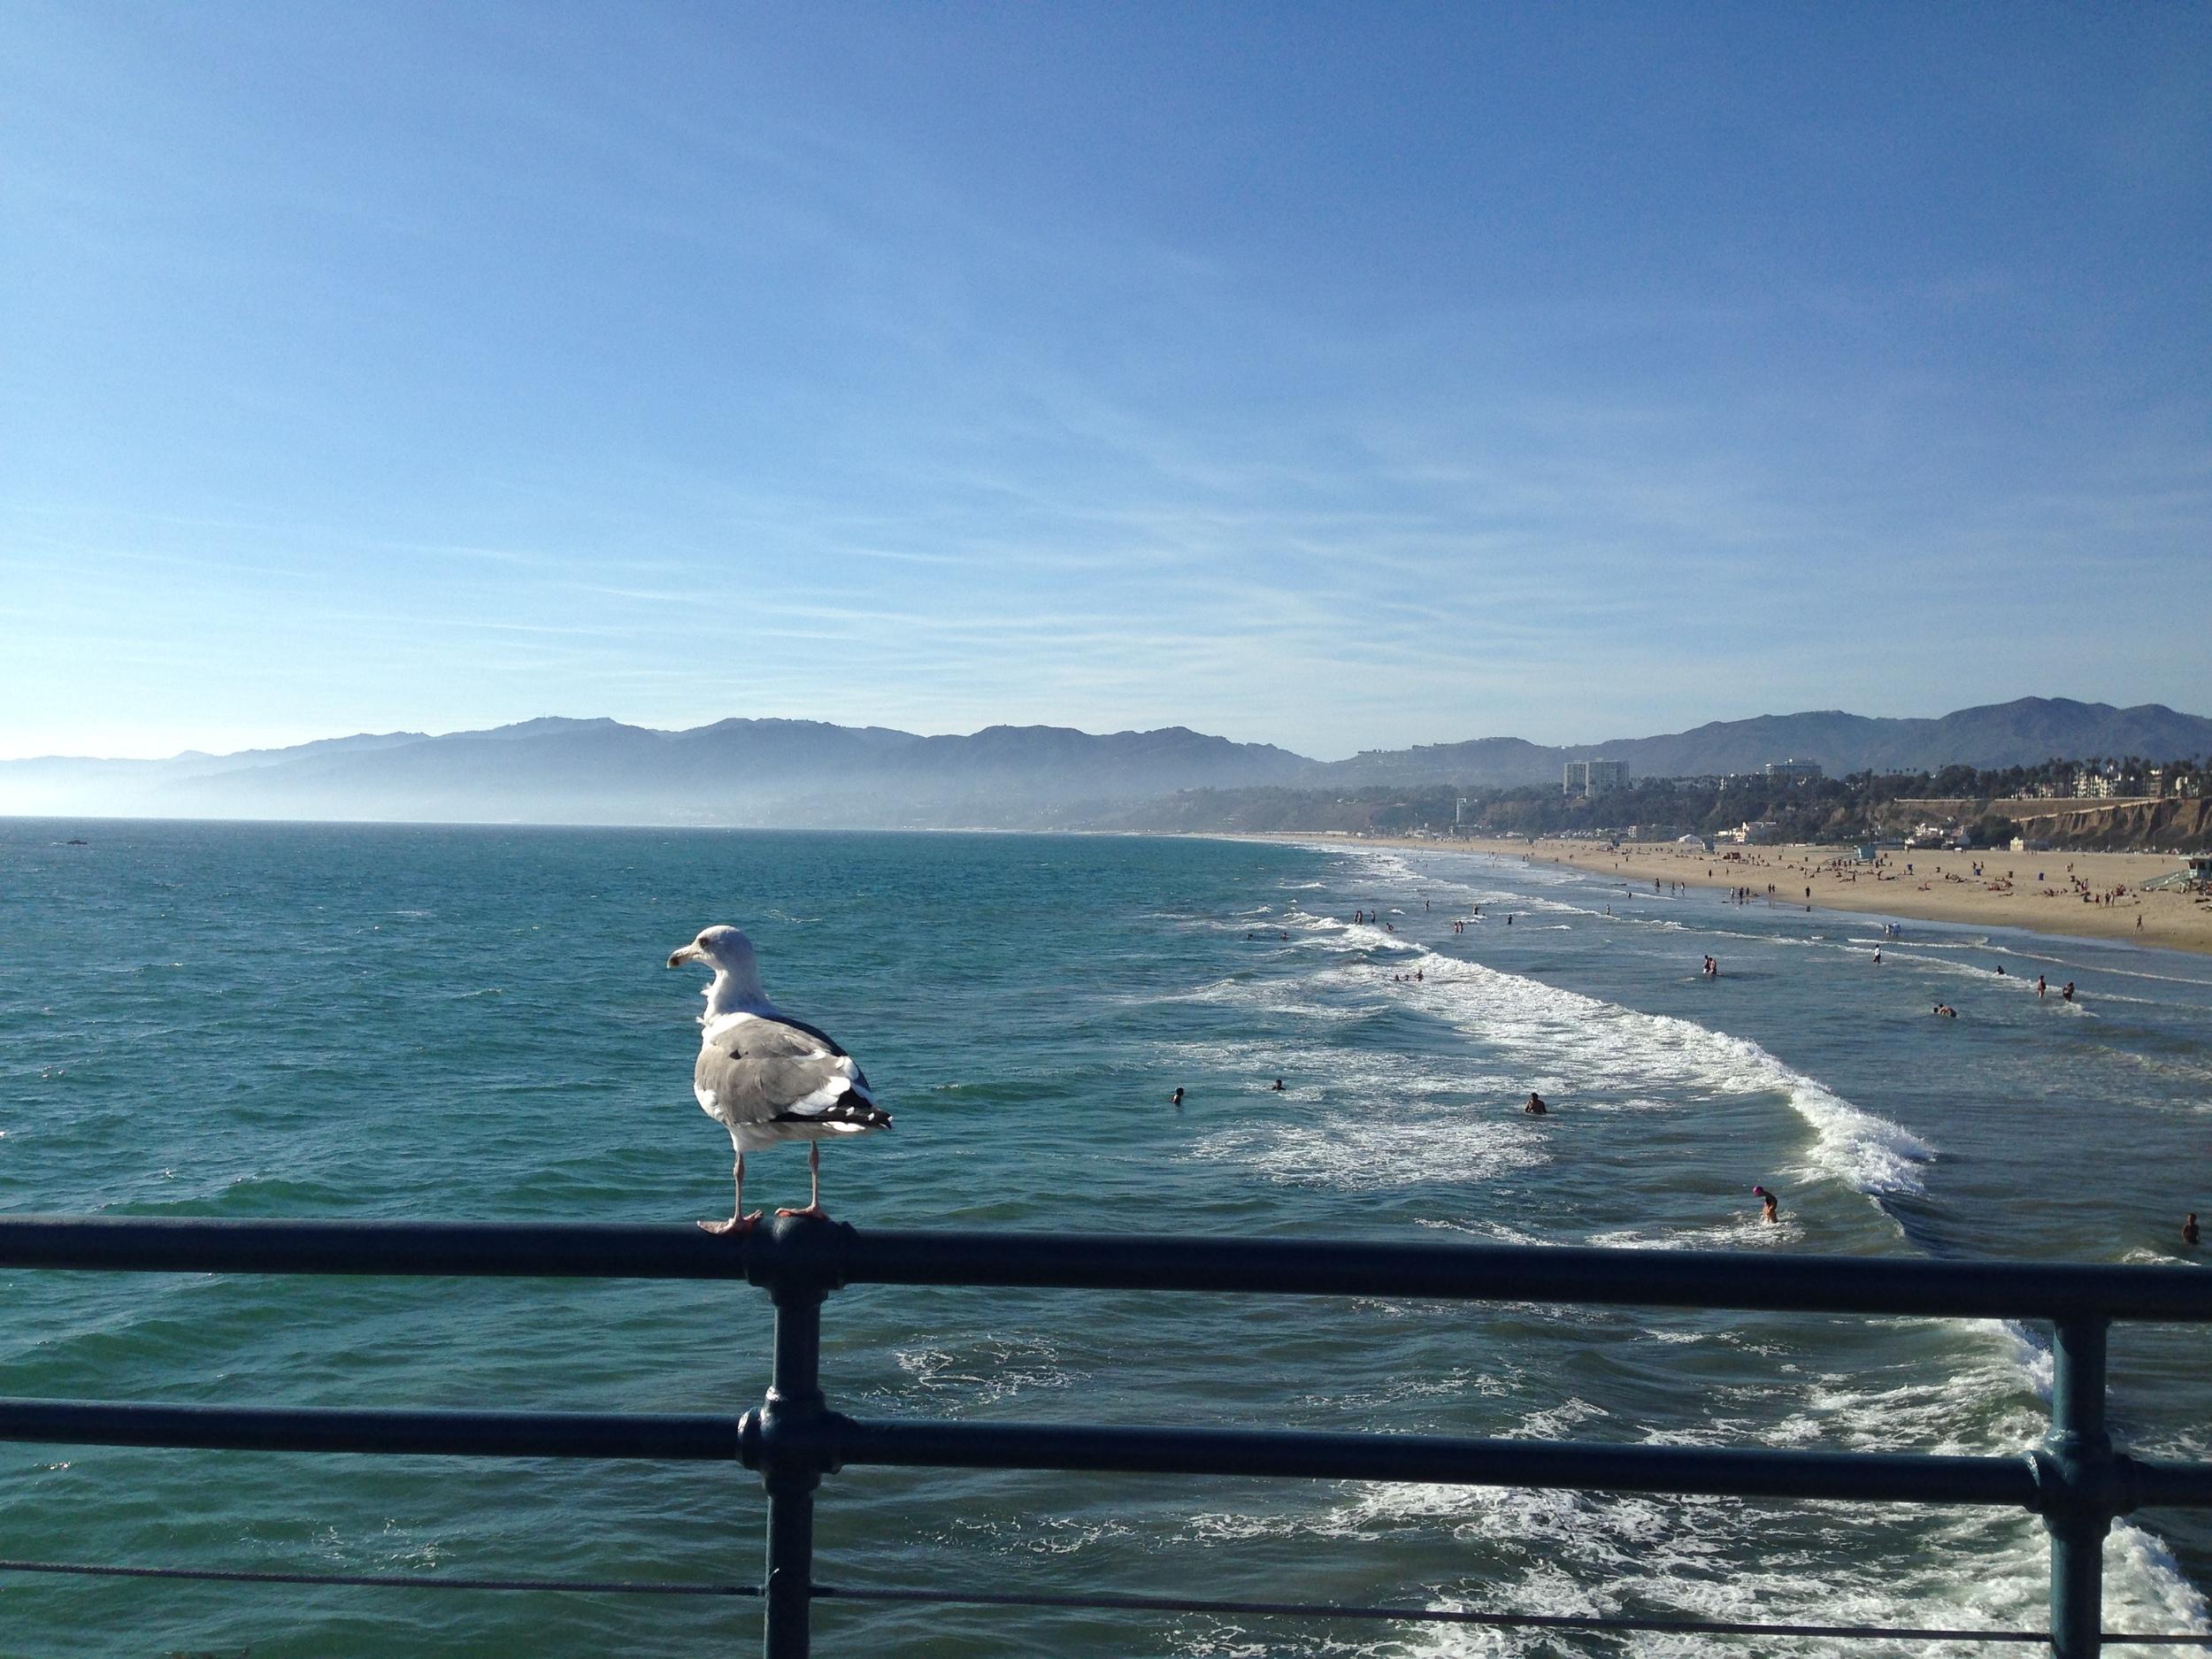 Santa Monica, CA, 9/9/14